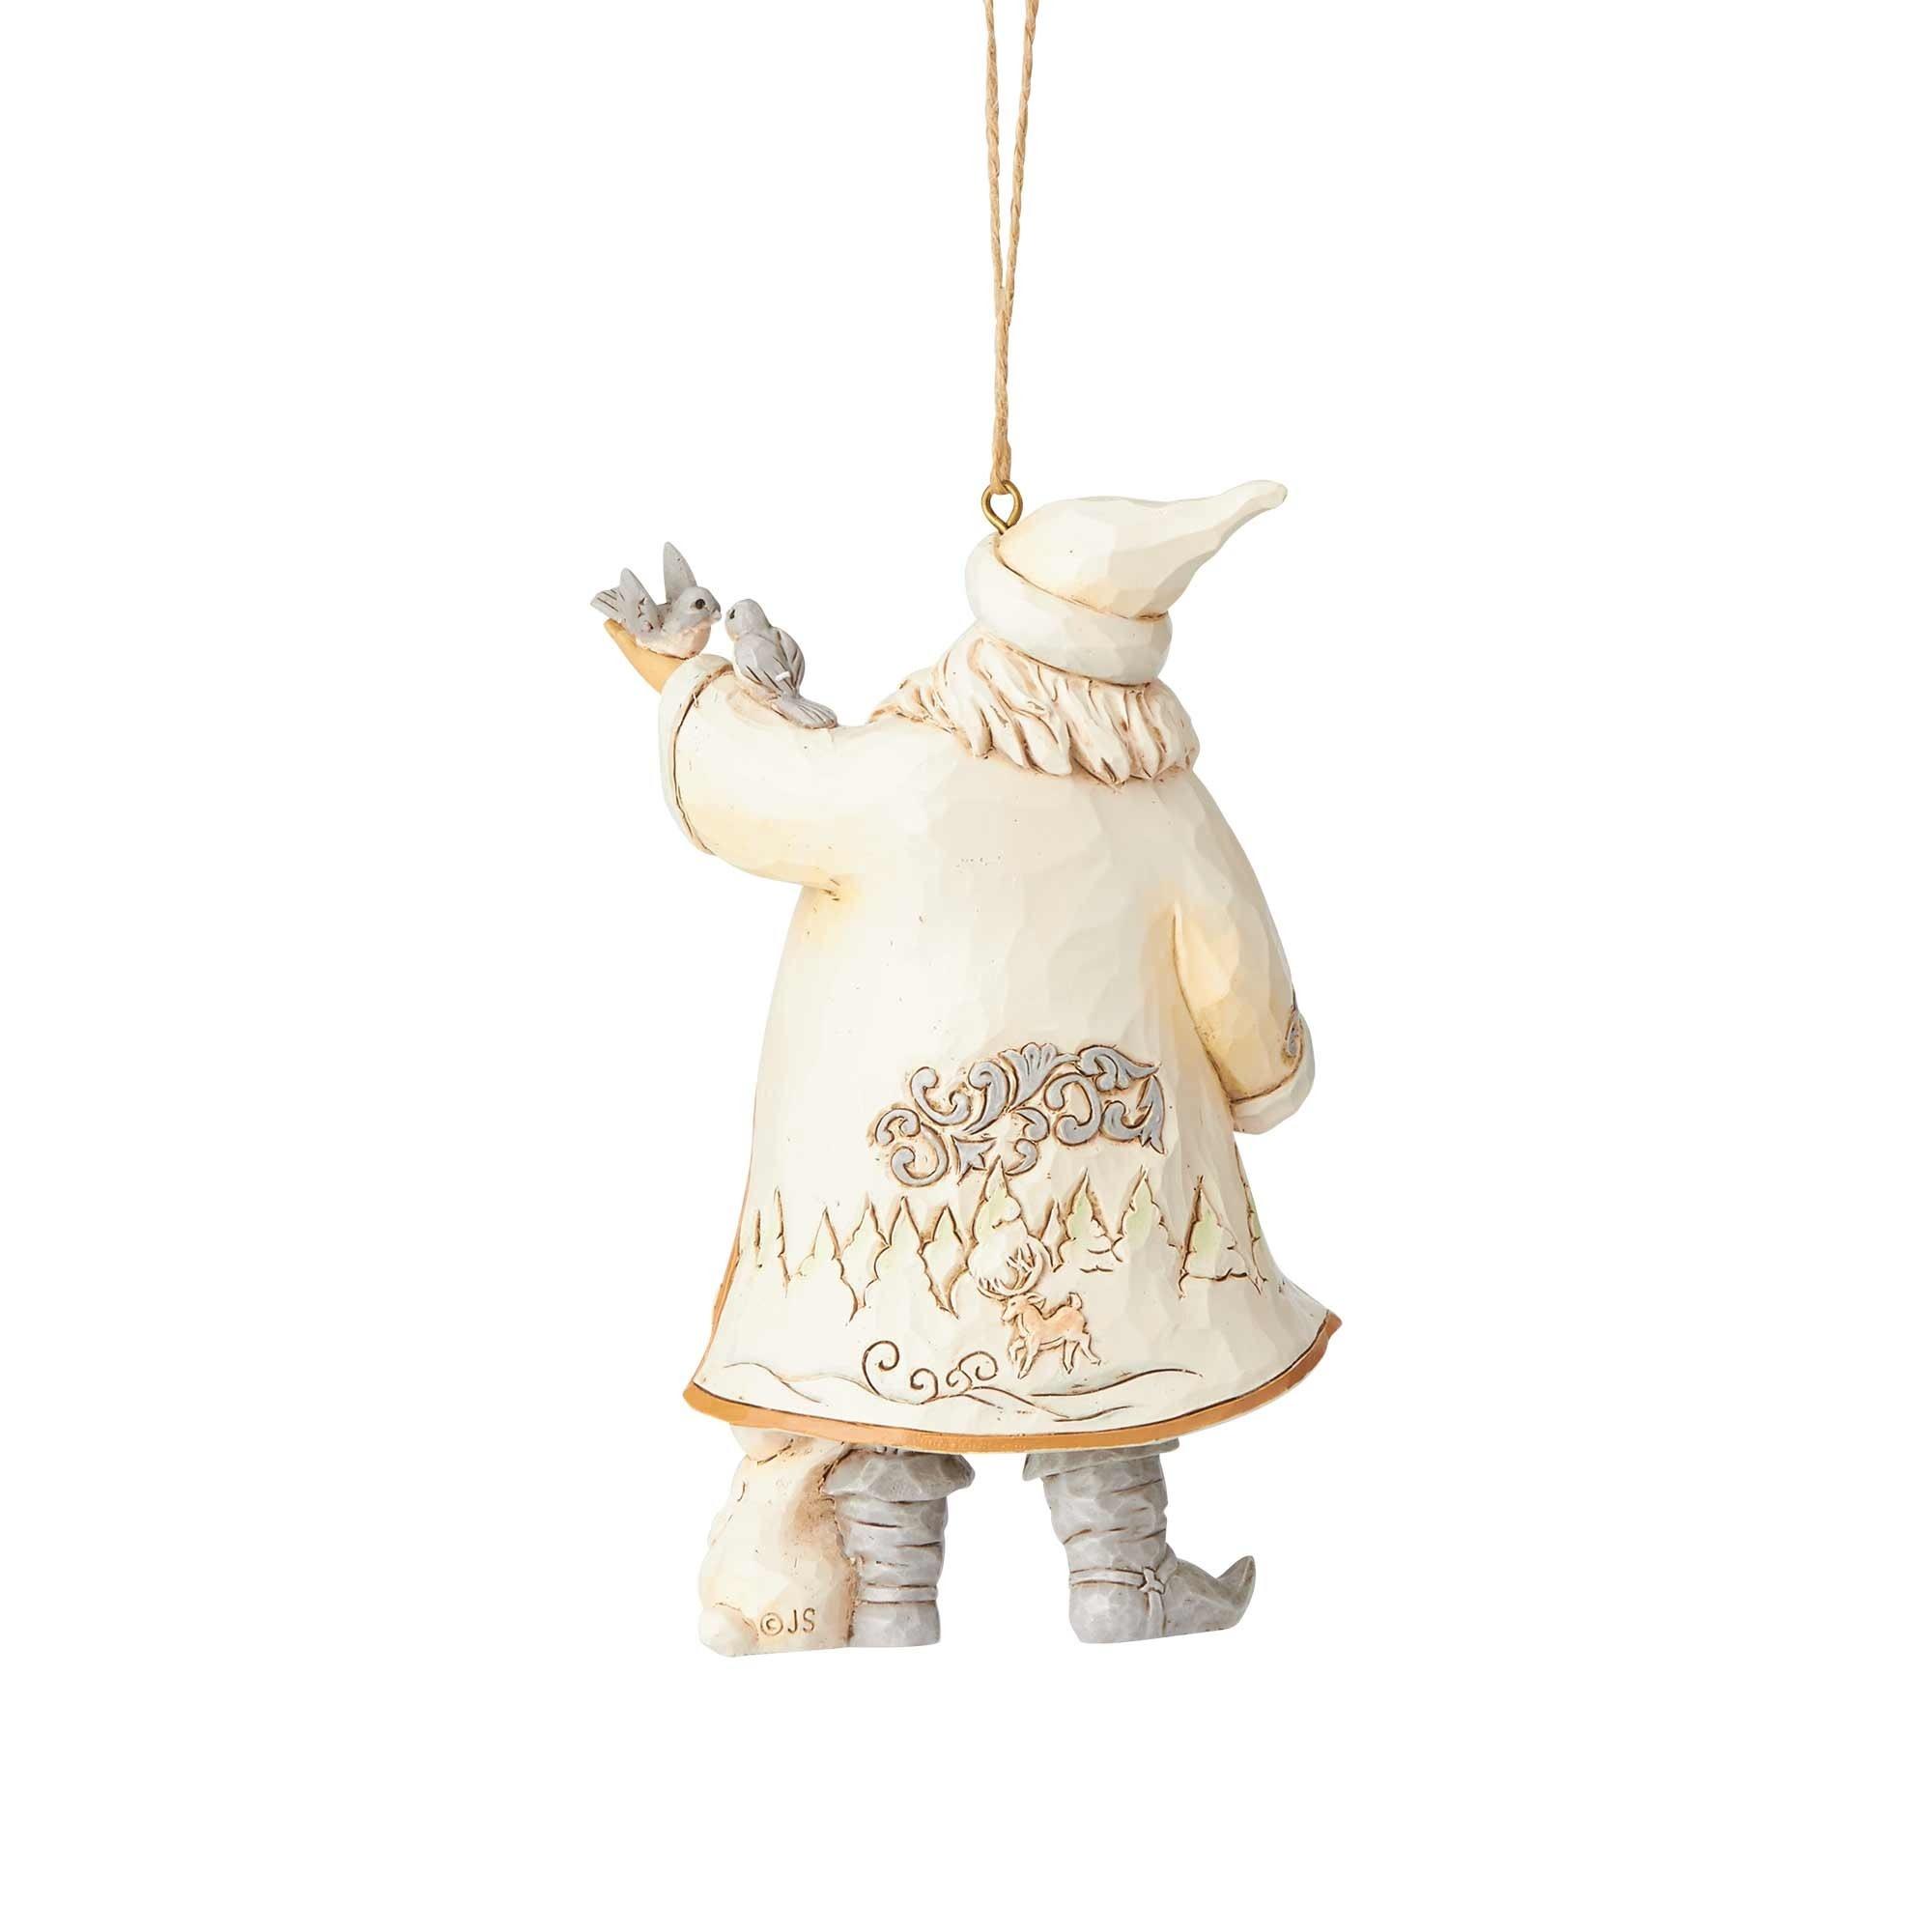 Jim Shore Woodland Santa with Birds Ornament